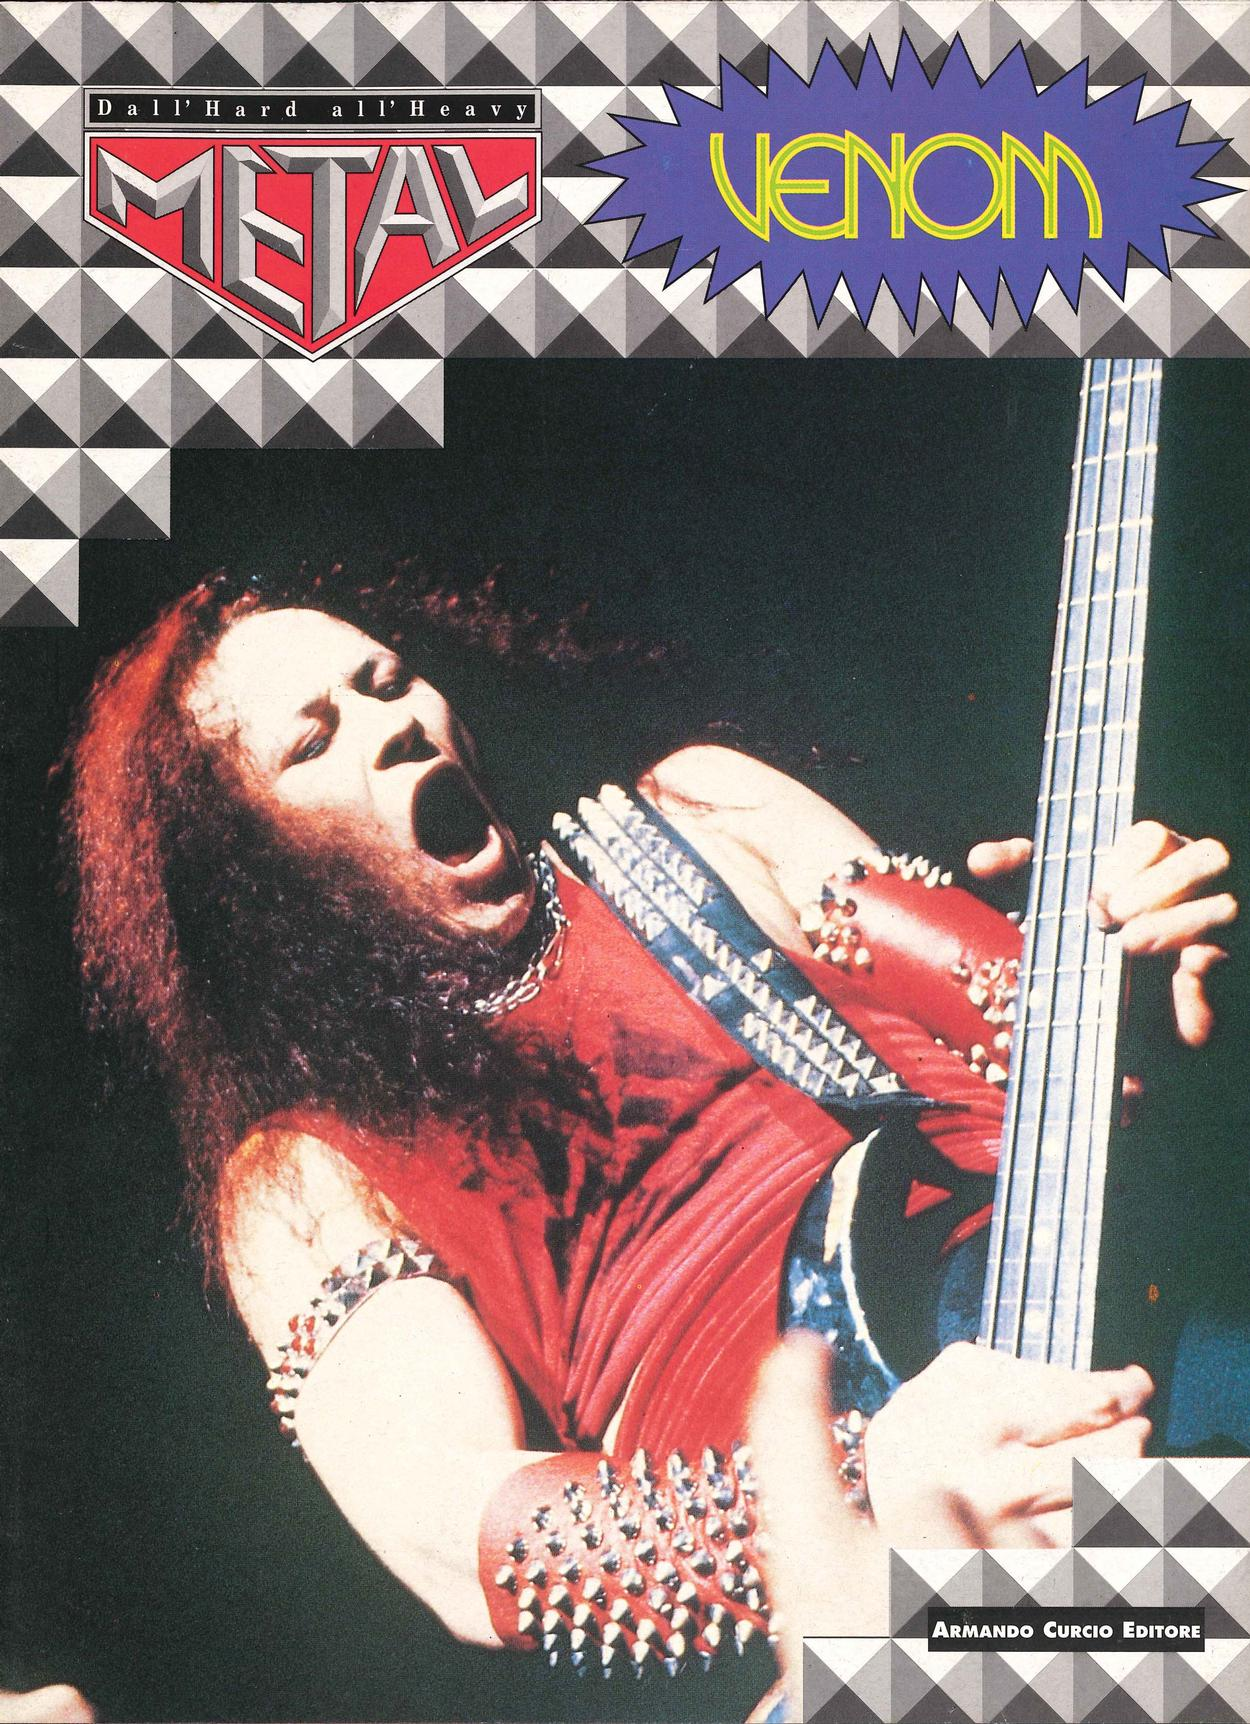 venom black metal magazine cover